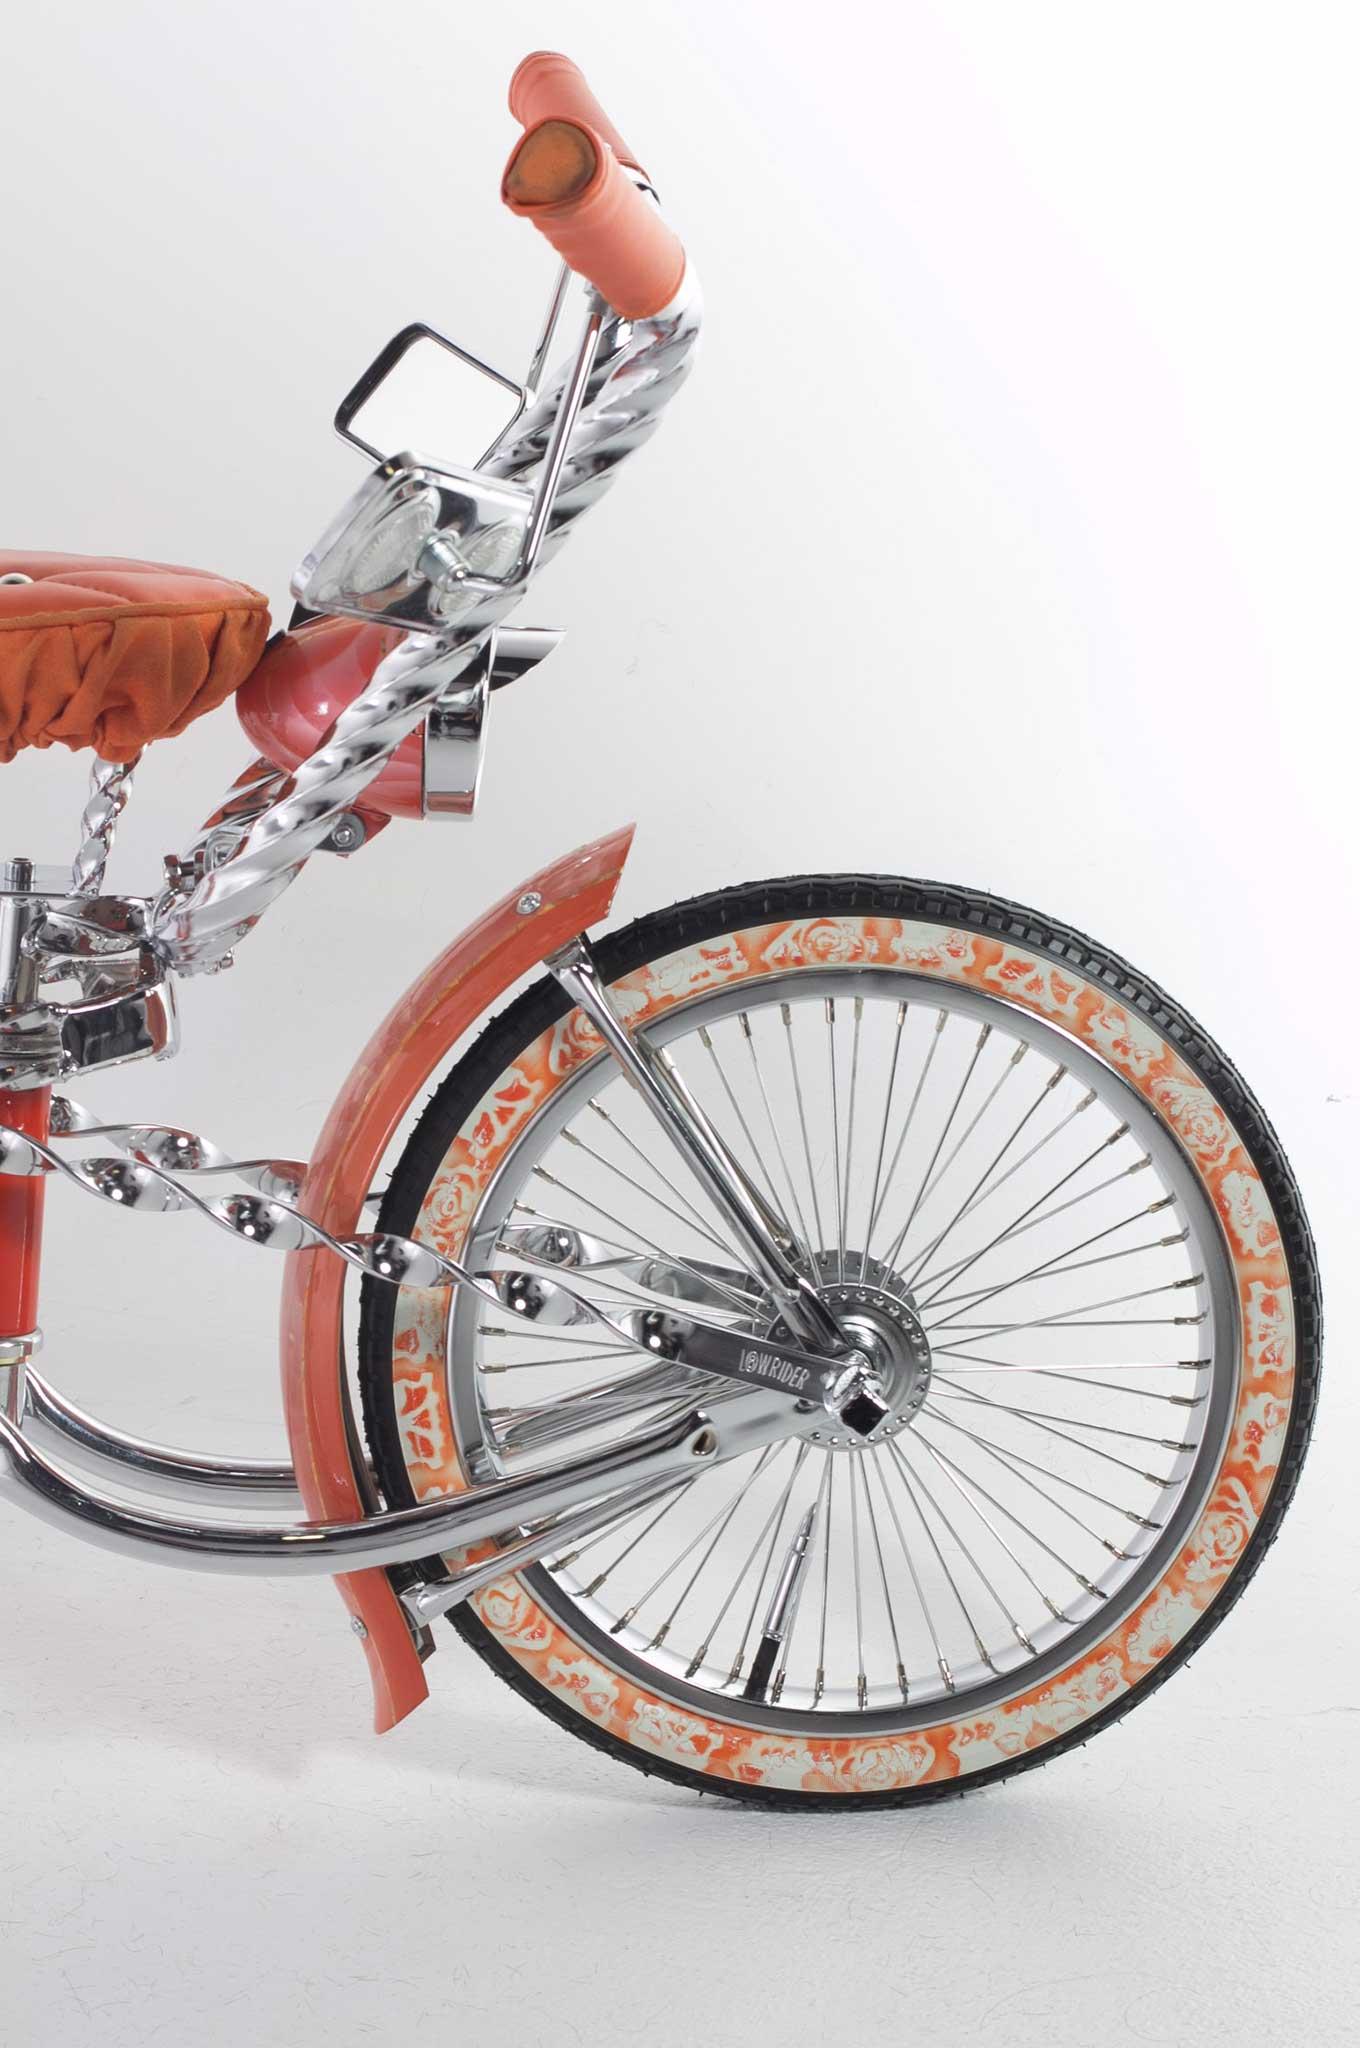 2015 Dodge Magnum >> 1996 16-inch Lowrider Bike - The Godfather - Lowrider